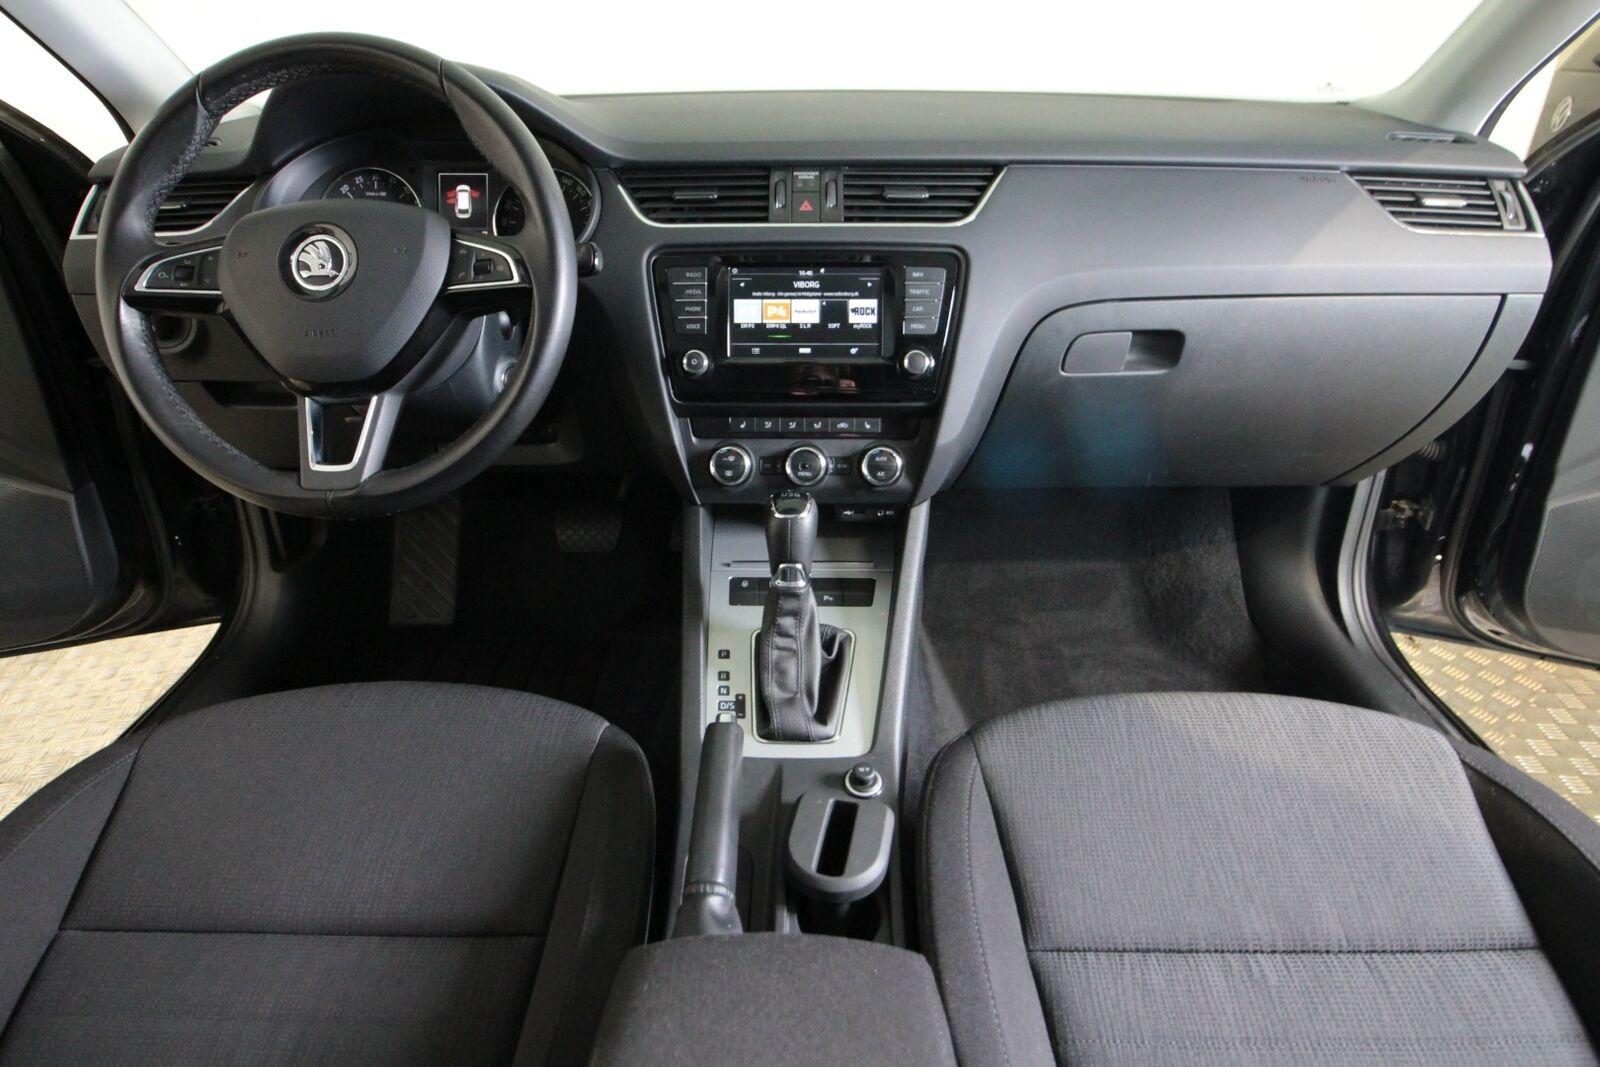 Skoda Octavia TDi 150 Style Combi DSG Van